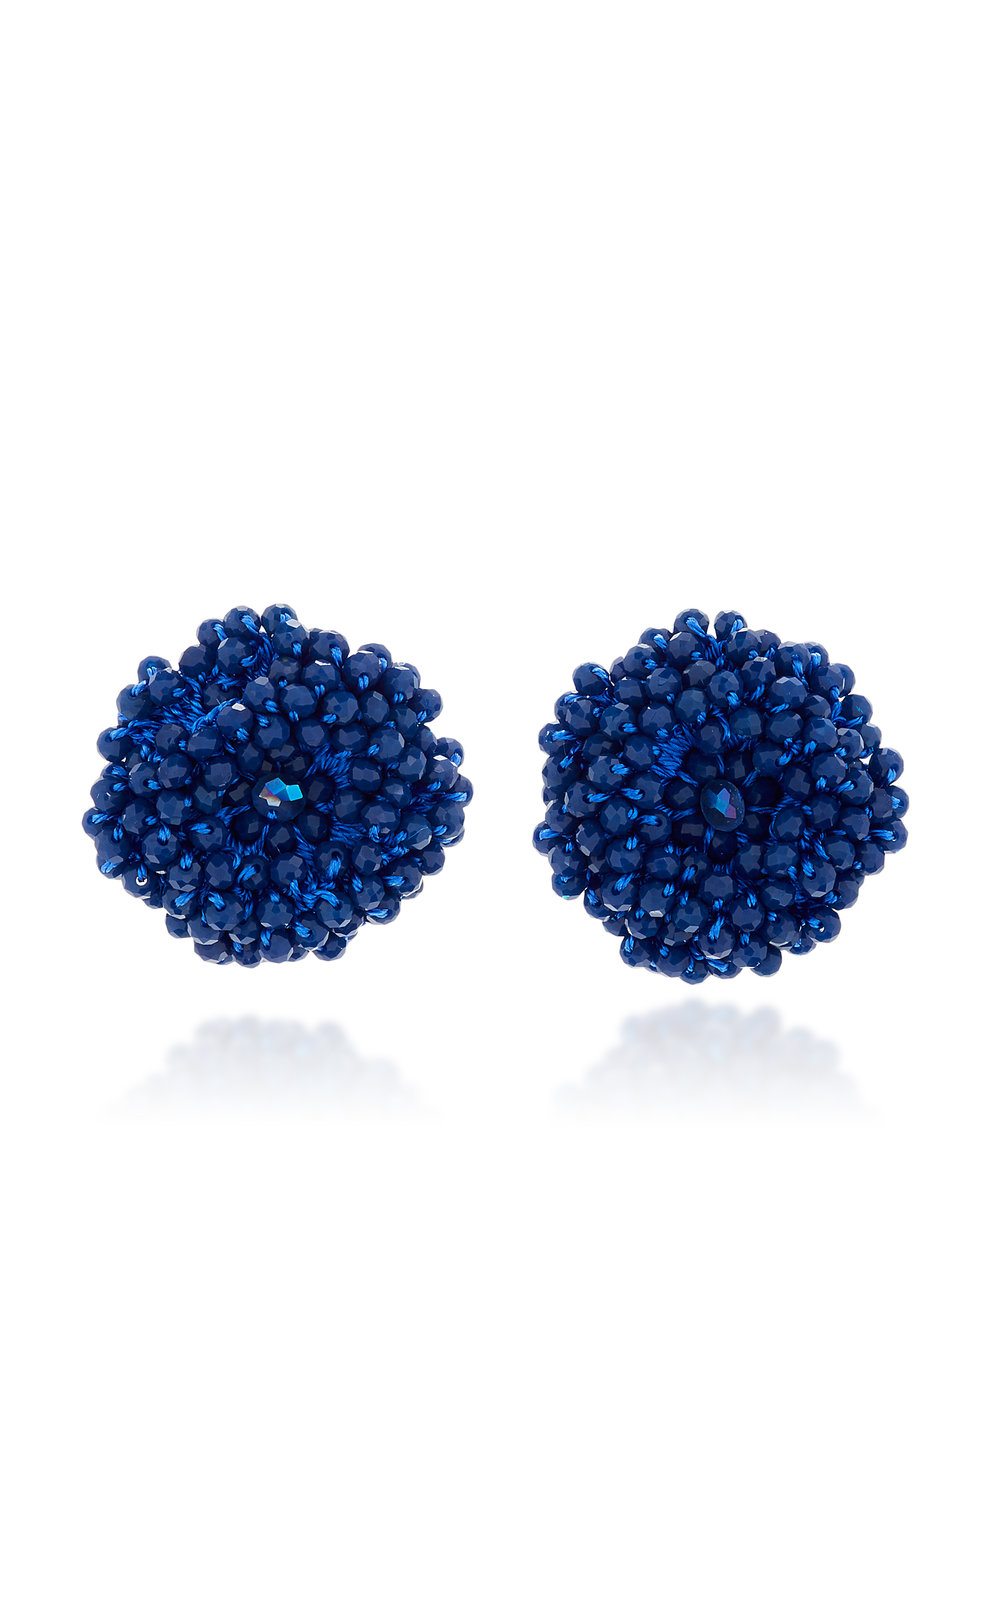 large_bibi-marini-blue-blue-beaded-blossom-earrings.jpg